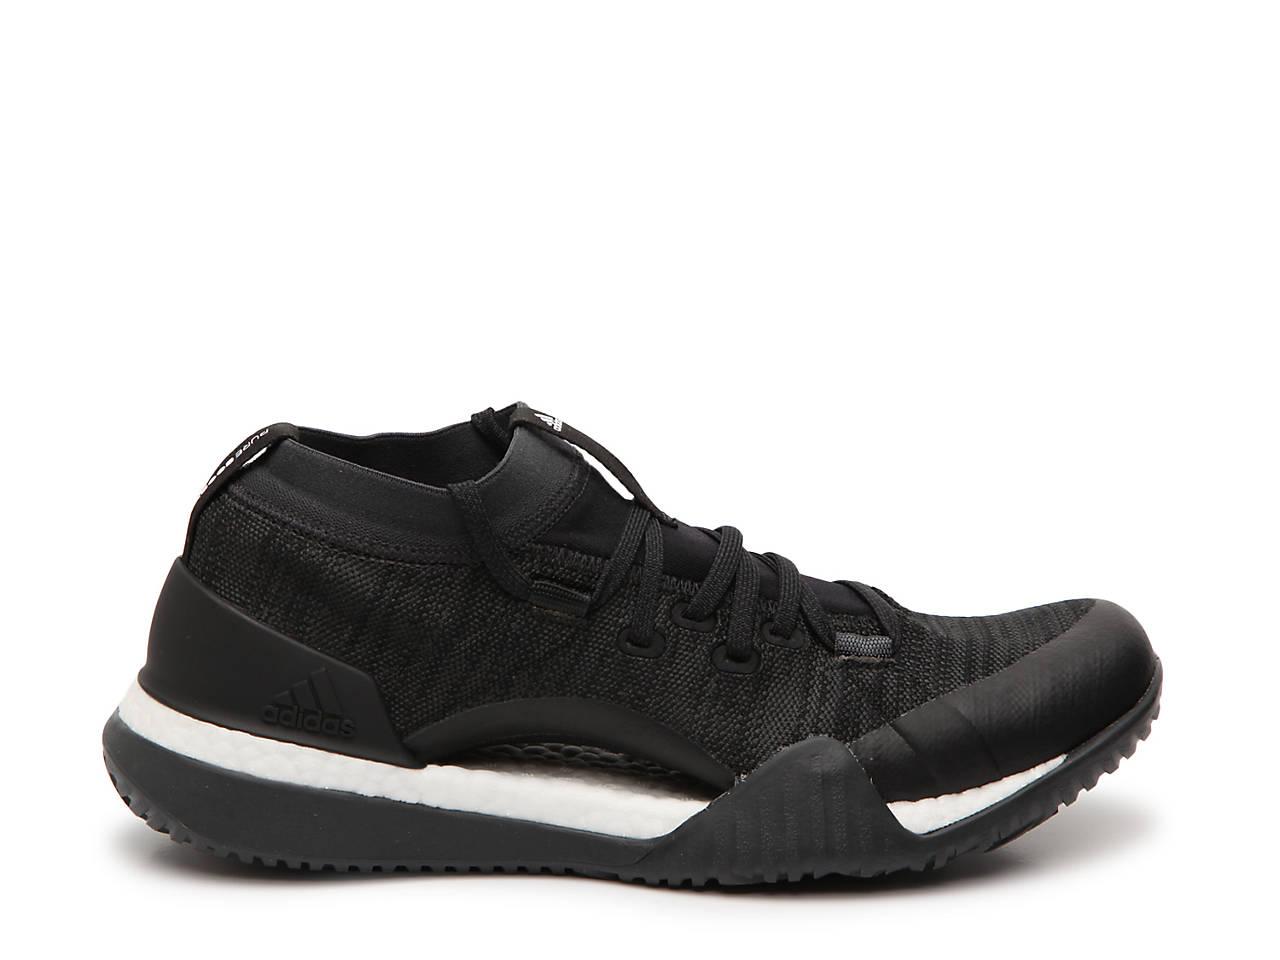 541d064f4b9 adidas Pureboost X TR 3.0 Training Shoe - Women s Women s Shoes